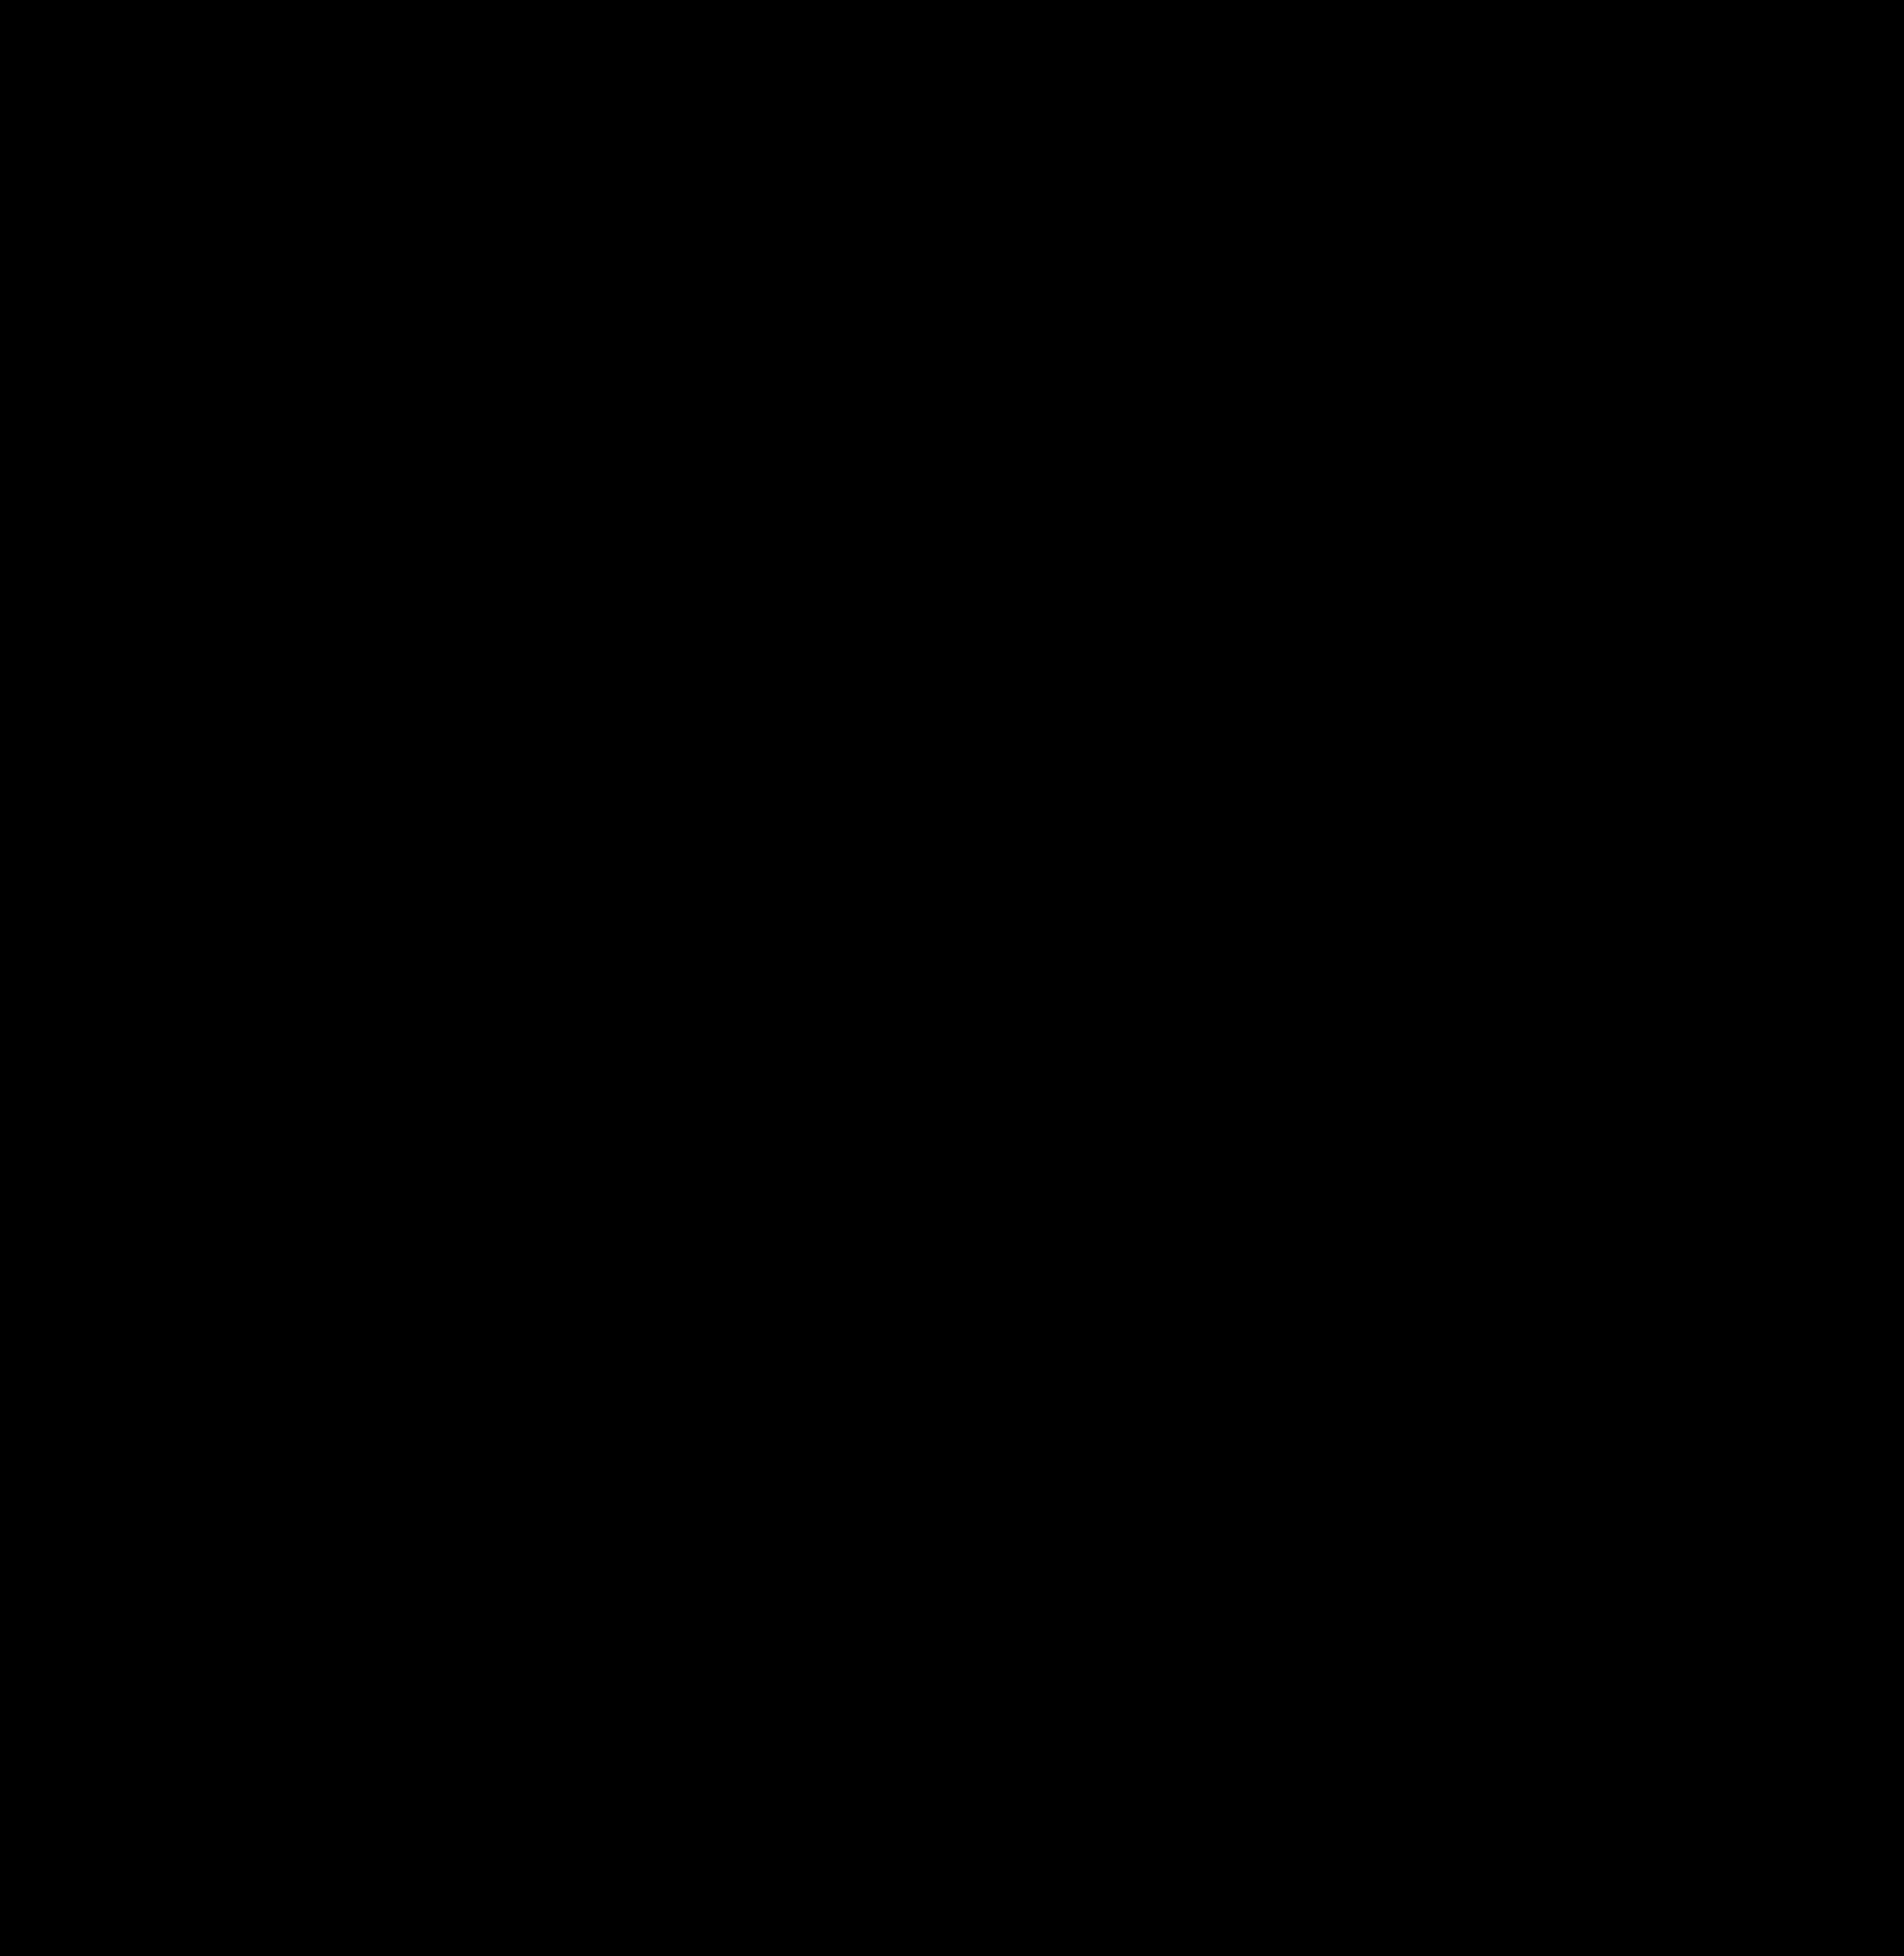 Труш (Слоневська) Аріадна, мистецтвознавець